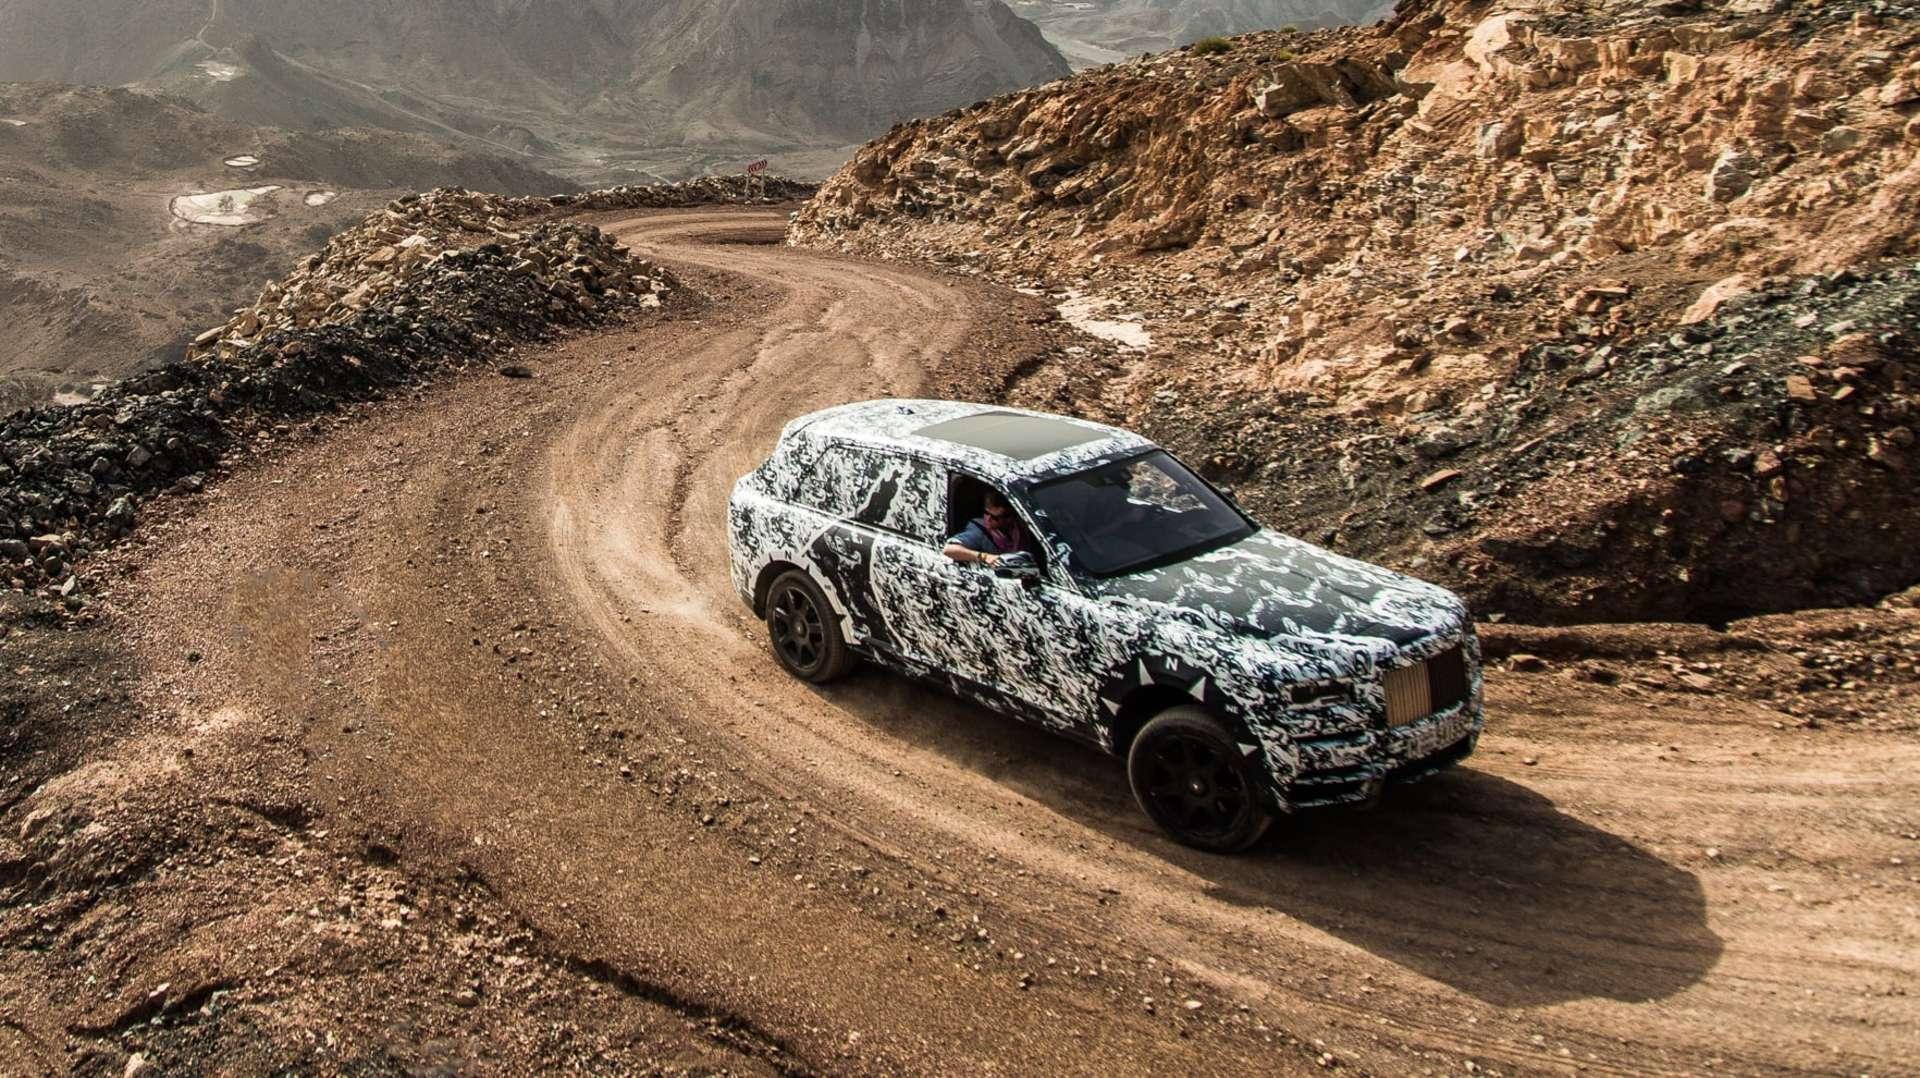 A Rolls-Royce Cullinan motor car driving through rocky terrain